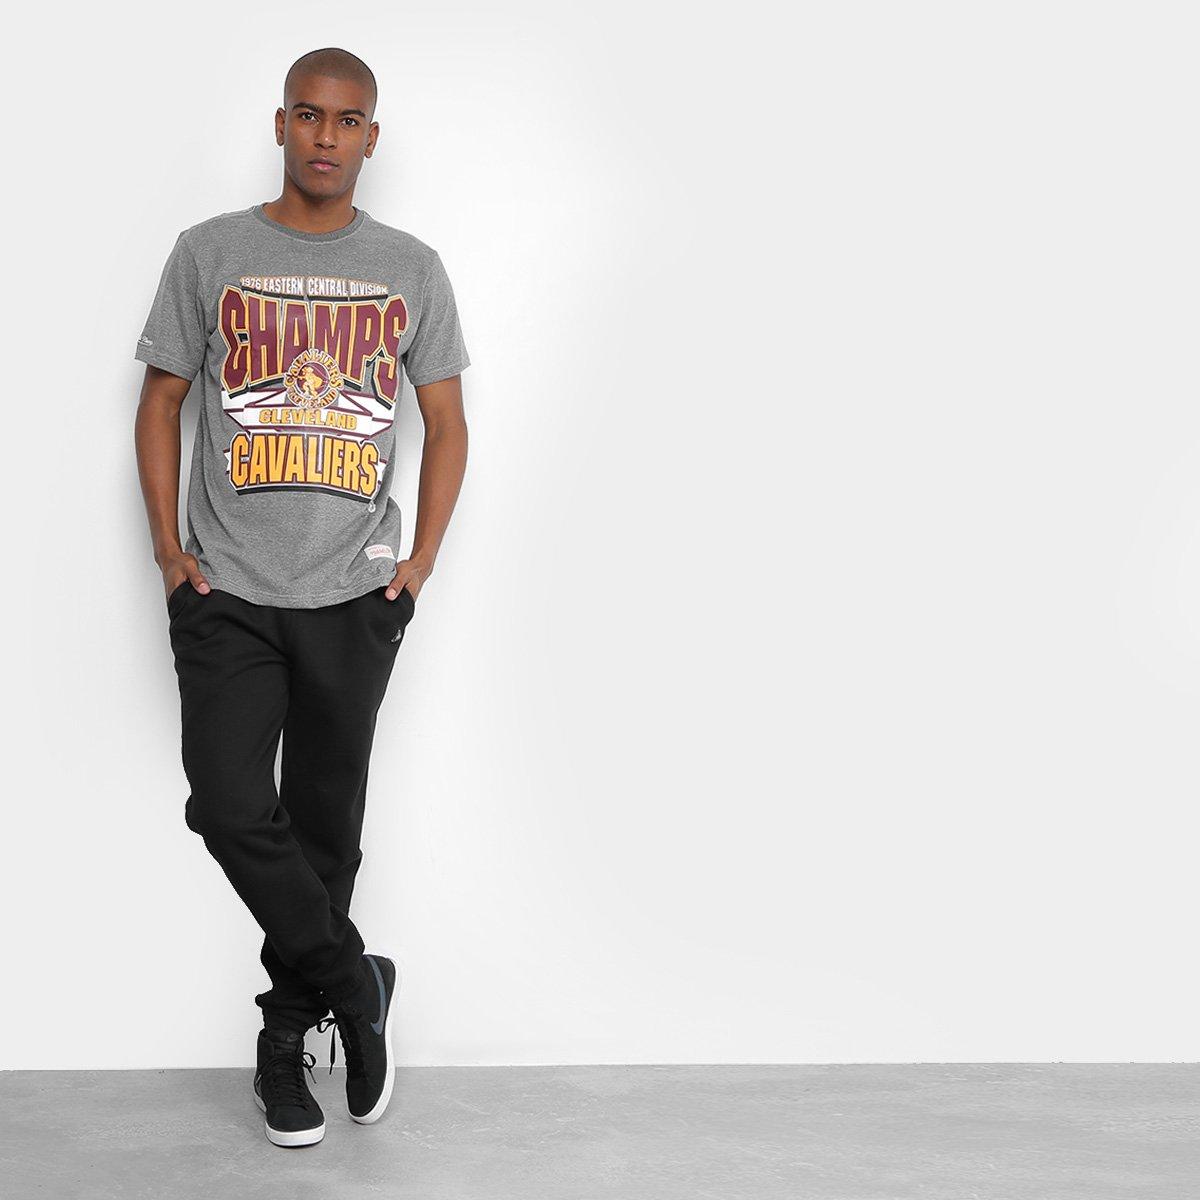 ... Camiseta Mitchell   Ness NBA Cleveland Cavaliers Sportman Crew  Masculina ... 5126d565aa925